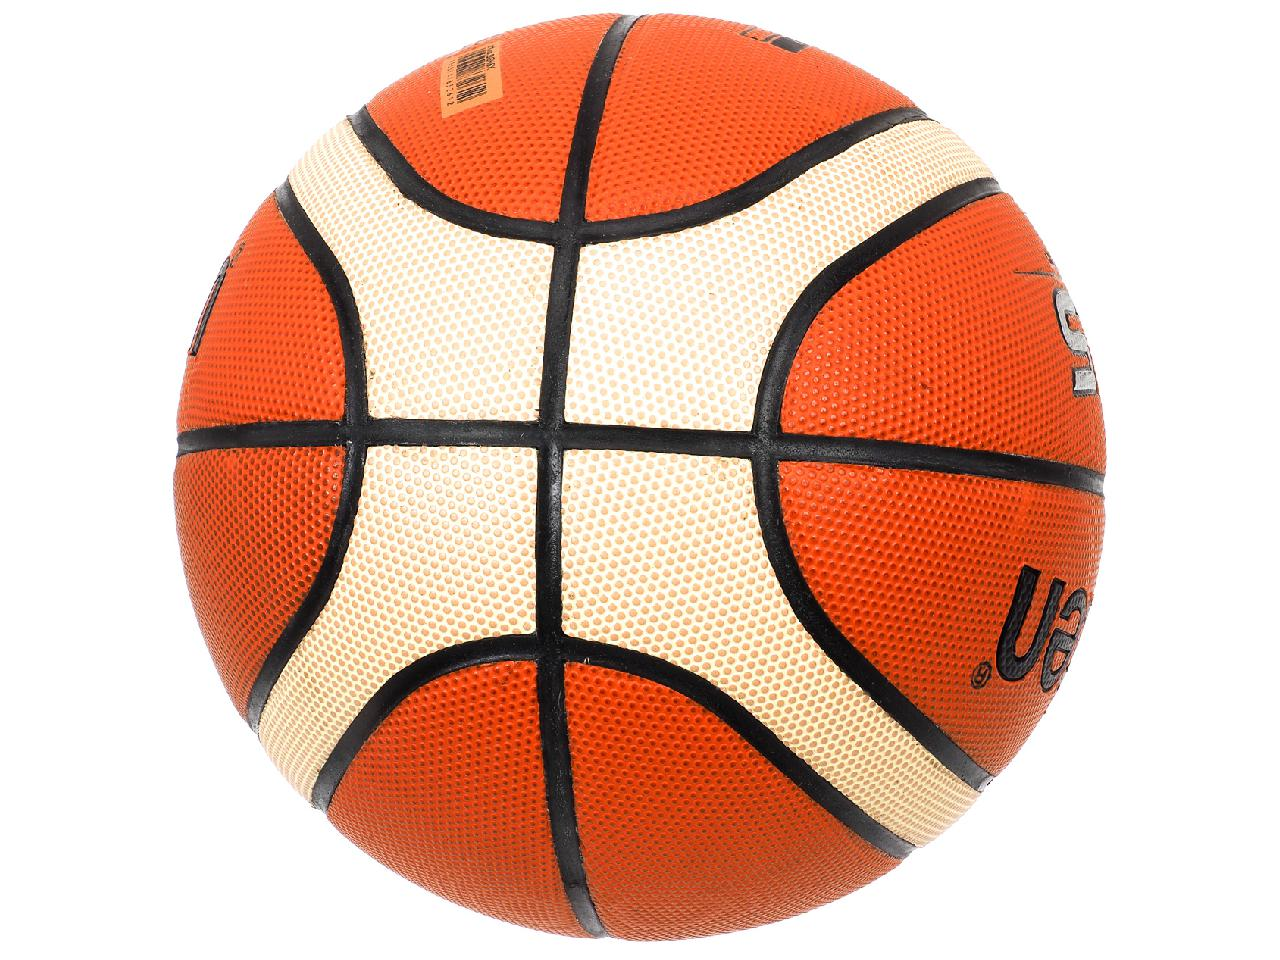 Ball-Of-Basketball-Molten-Gh6x-Training-Indoor-Orange-41622-New thumbnail 3